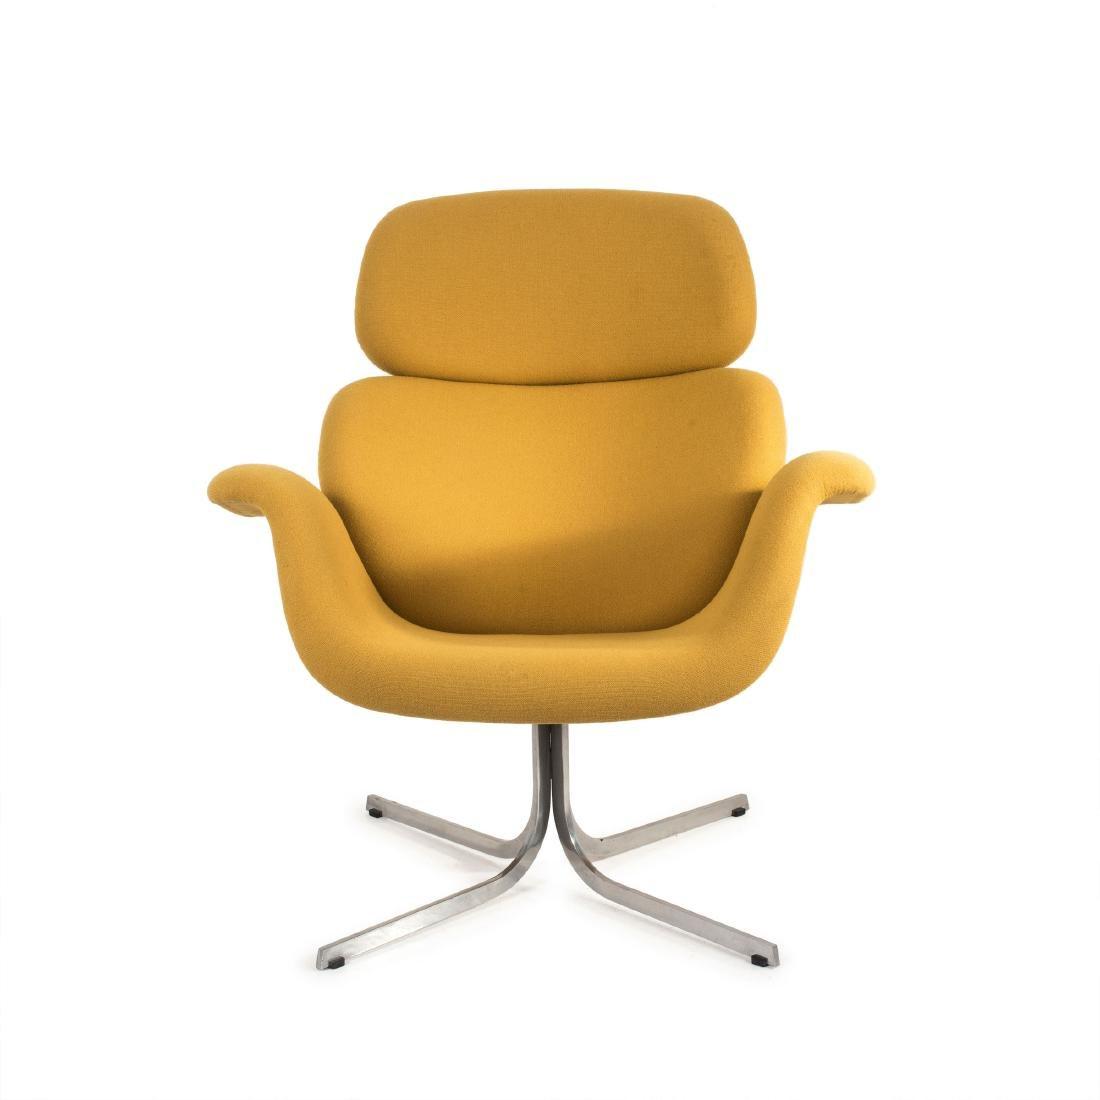 'F 545' - 'Big Tulip' easy chair, 1959